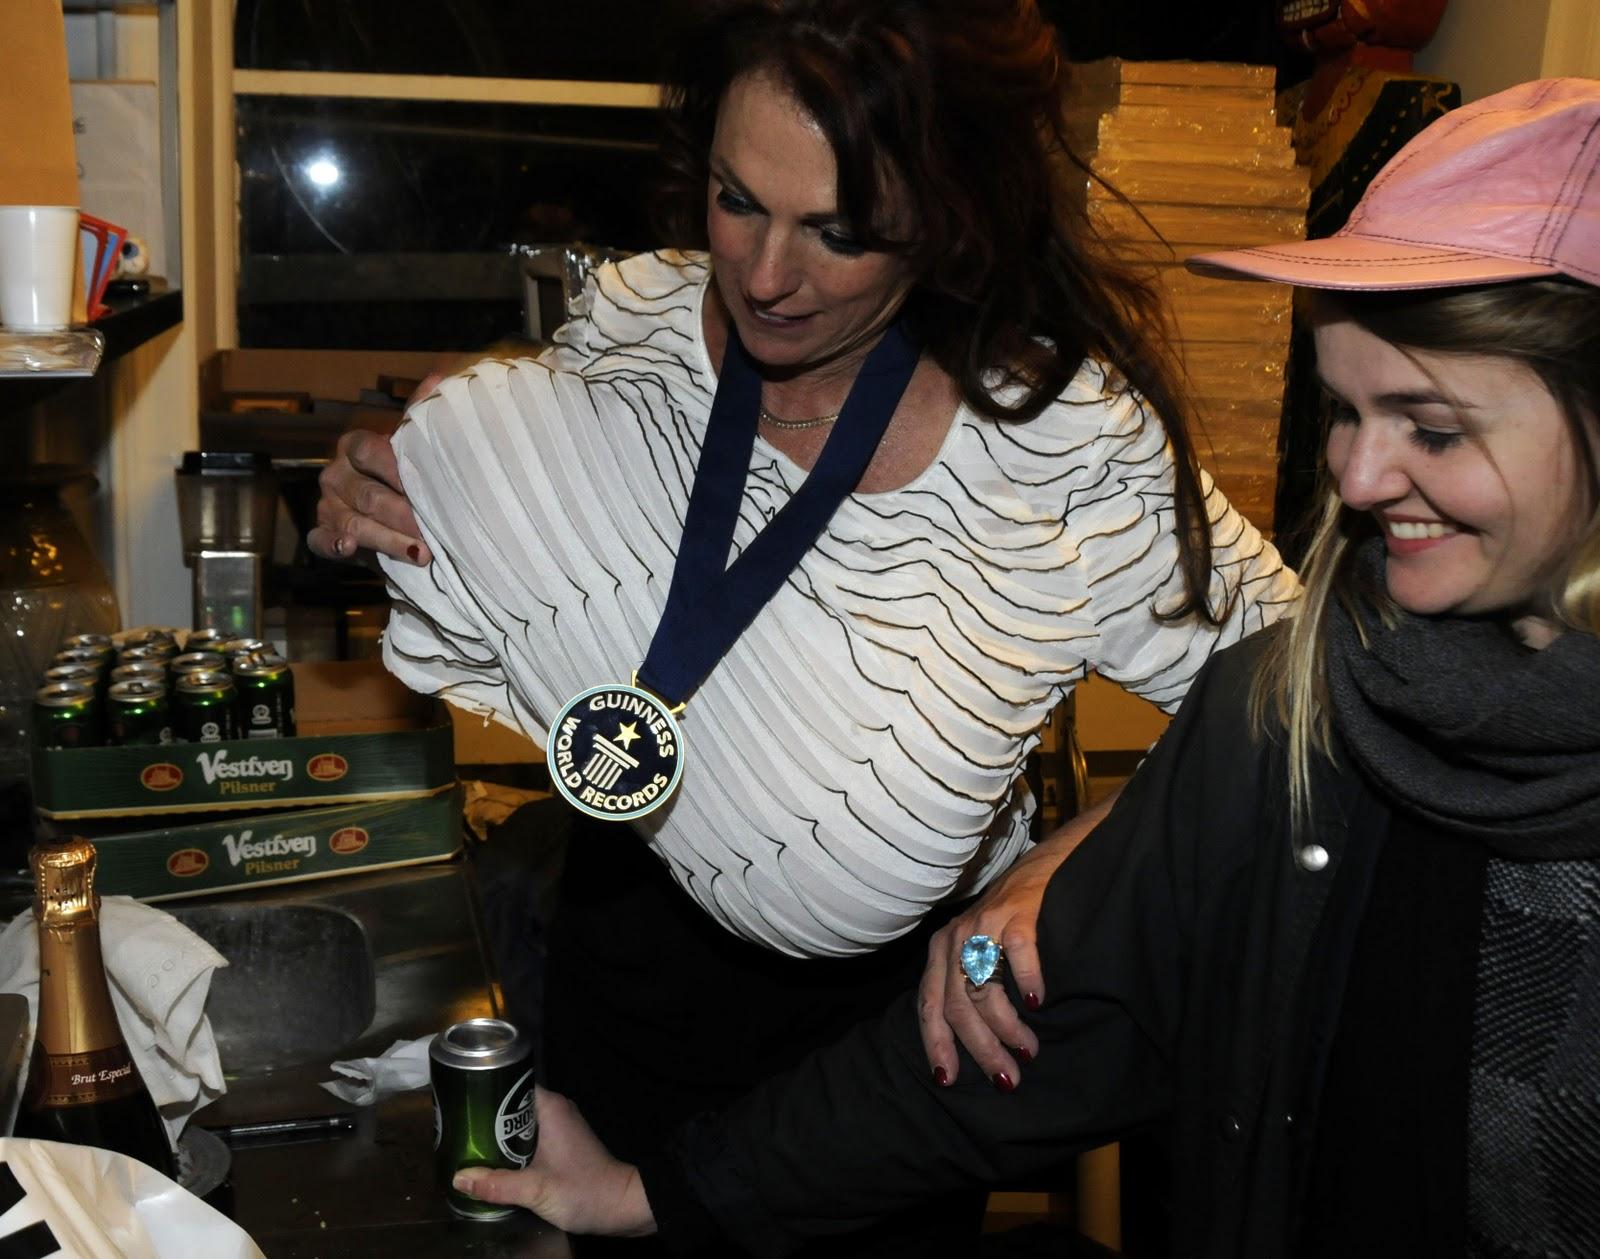 Sally Mortemore,Craig Charles (born 1964) Erotic videos Taylor Schilling,Liza Dino (b. ?)